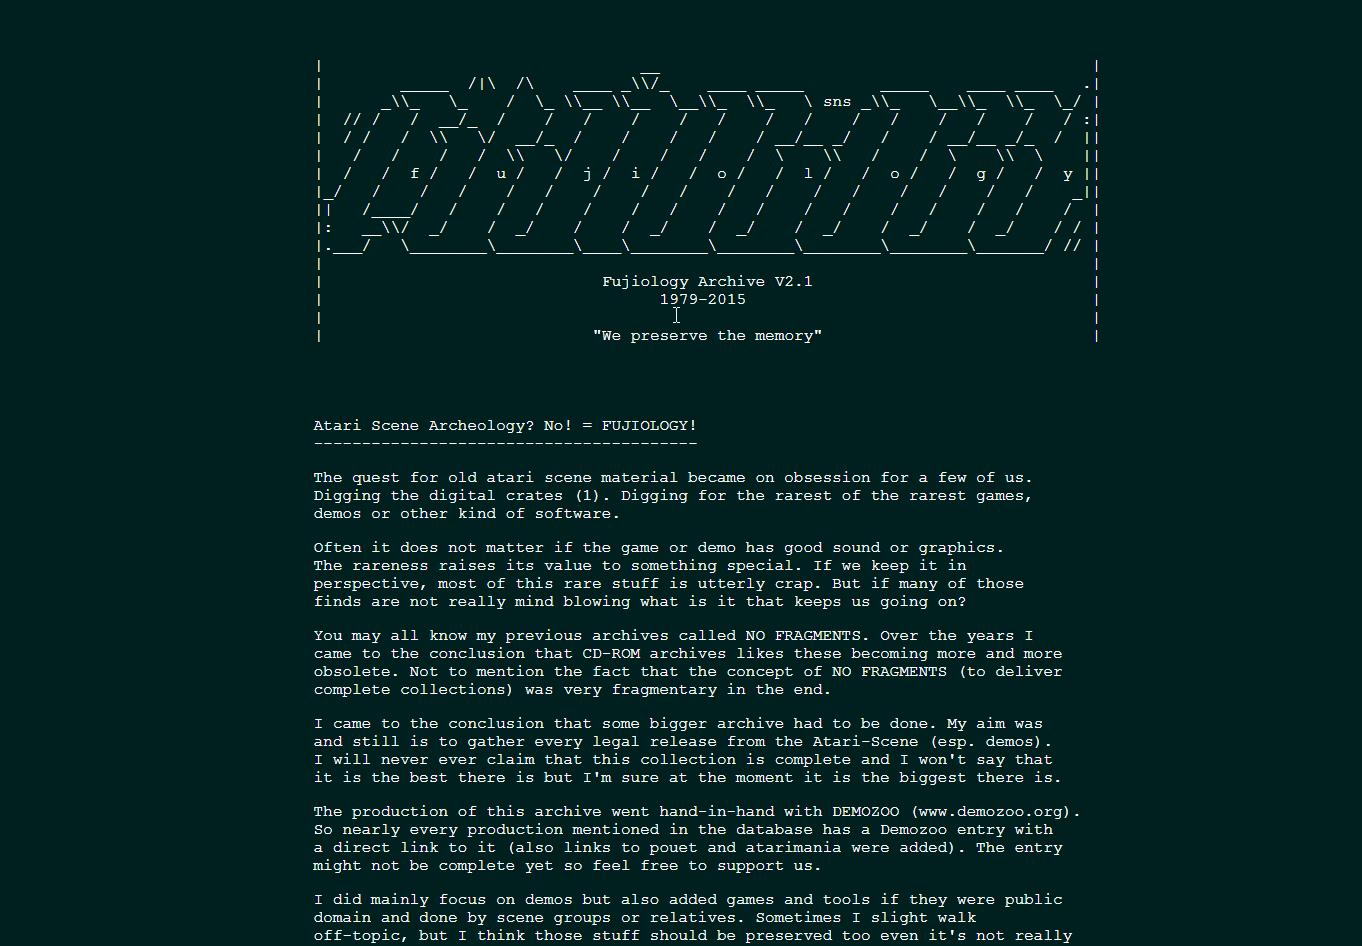 Screenshot of website Fujiology